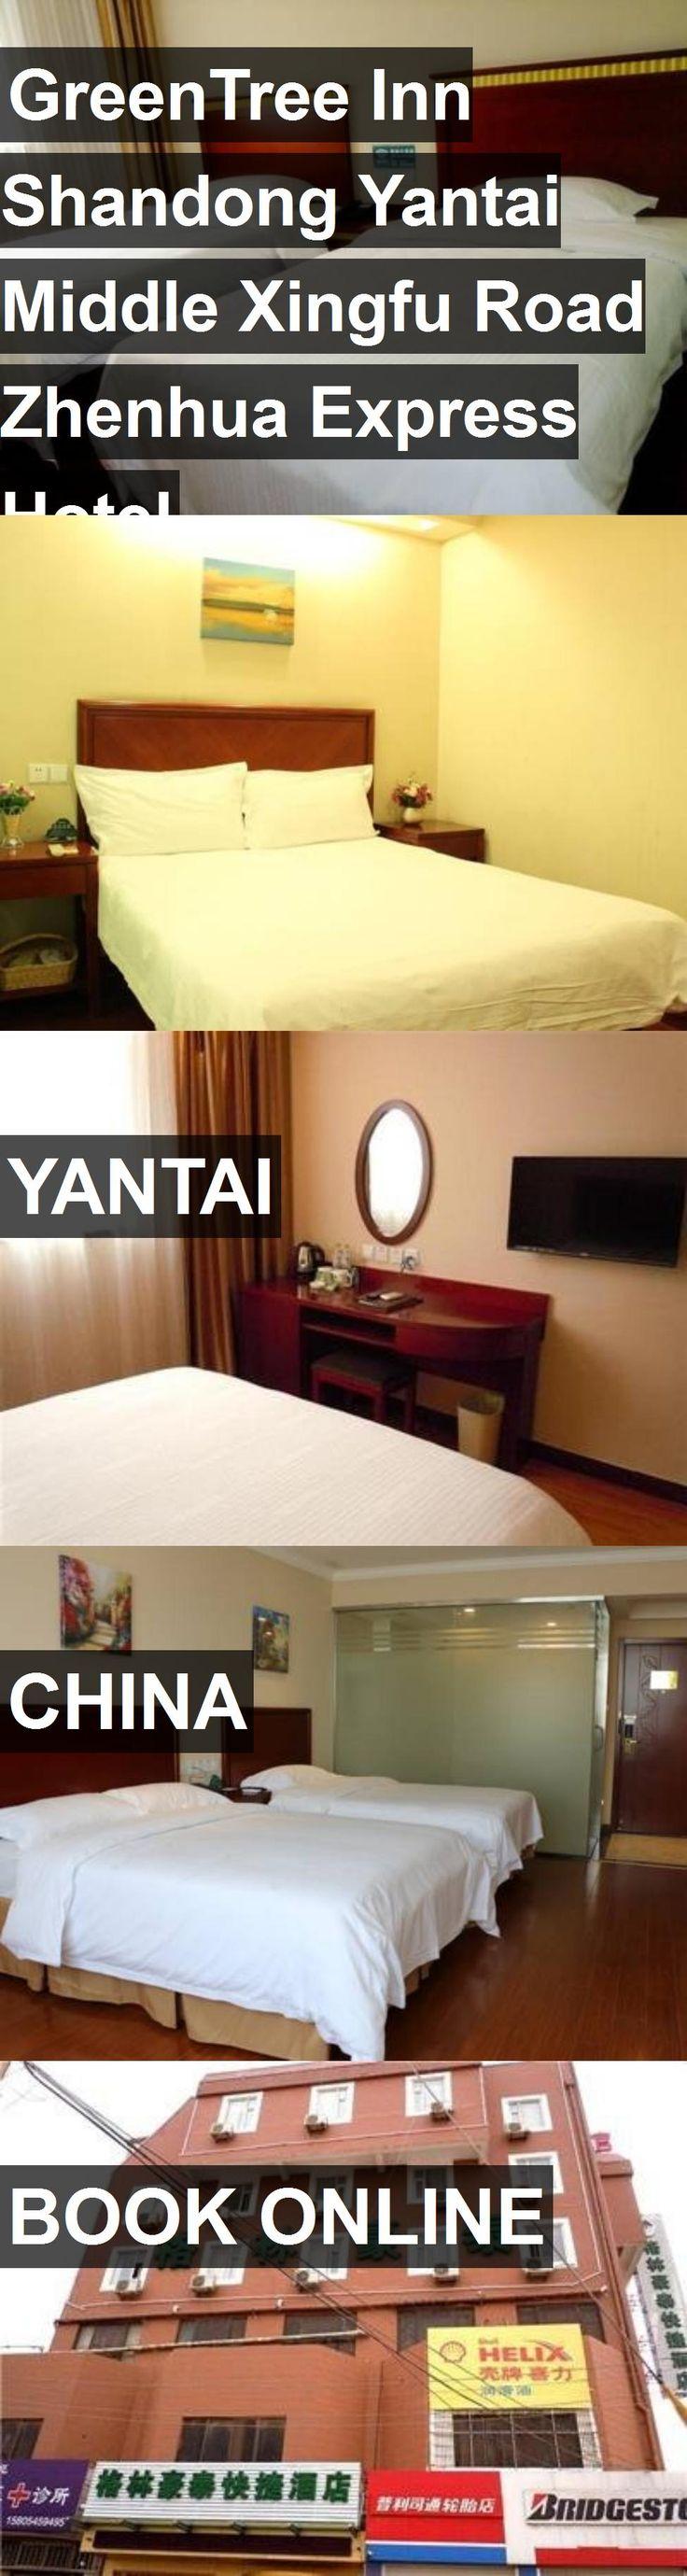 Hotel GreenTree Inn Shandong Yantai Middle Xingfu Road Zhenhua Express Hotel in Yantai, China. For more information, photos, reviews and best prices please follow the link. #China #Yantai #GreenTreeInnShandongYantaiMiddleXingfuRoadZhenhuaExpressHotel #hotel #travel #vacation